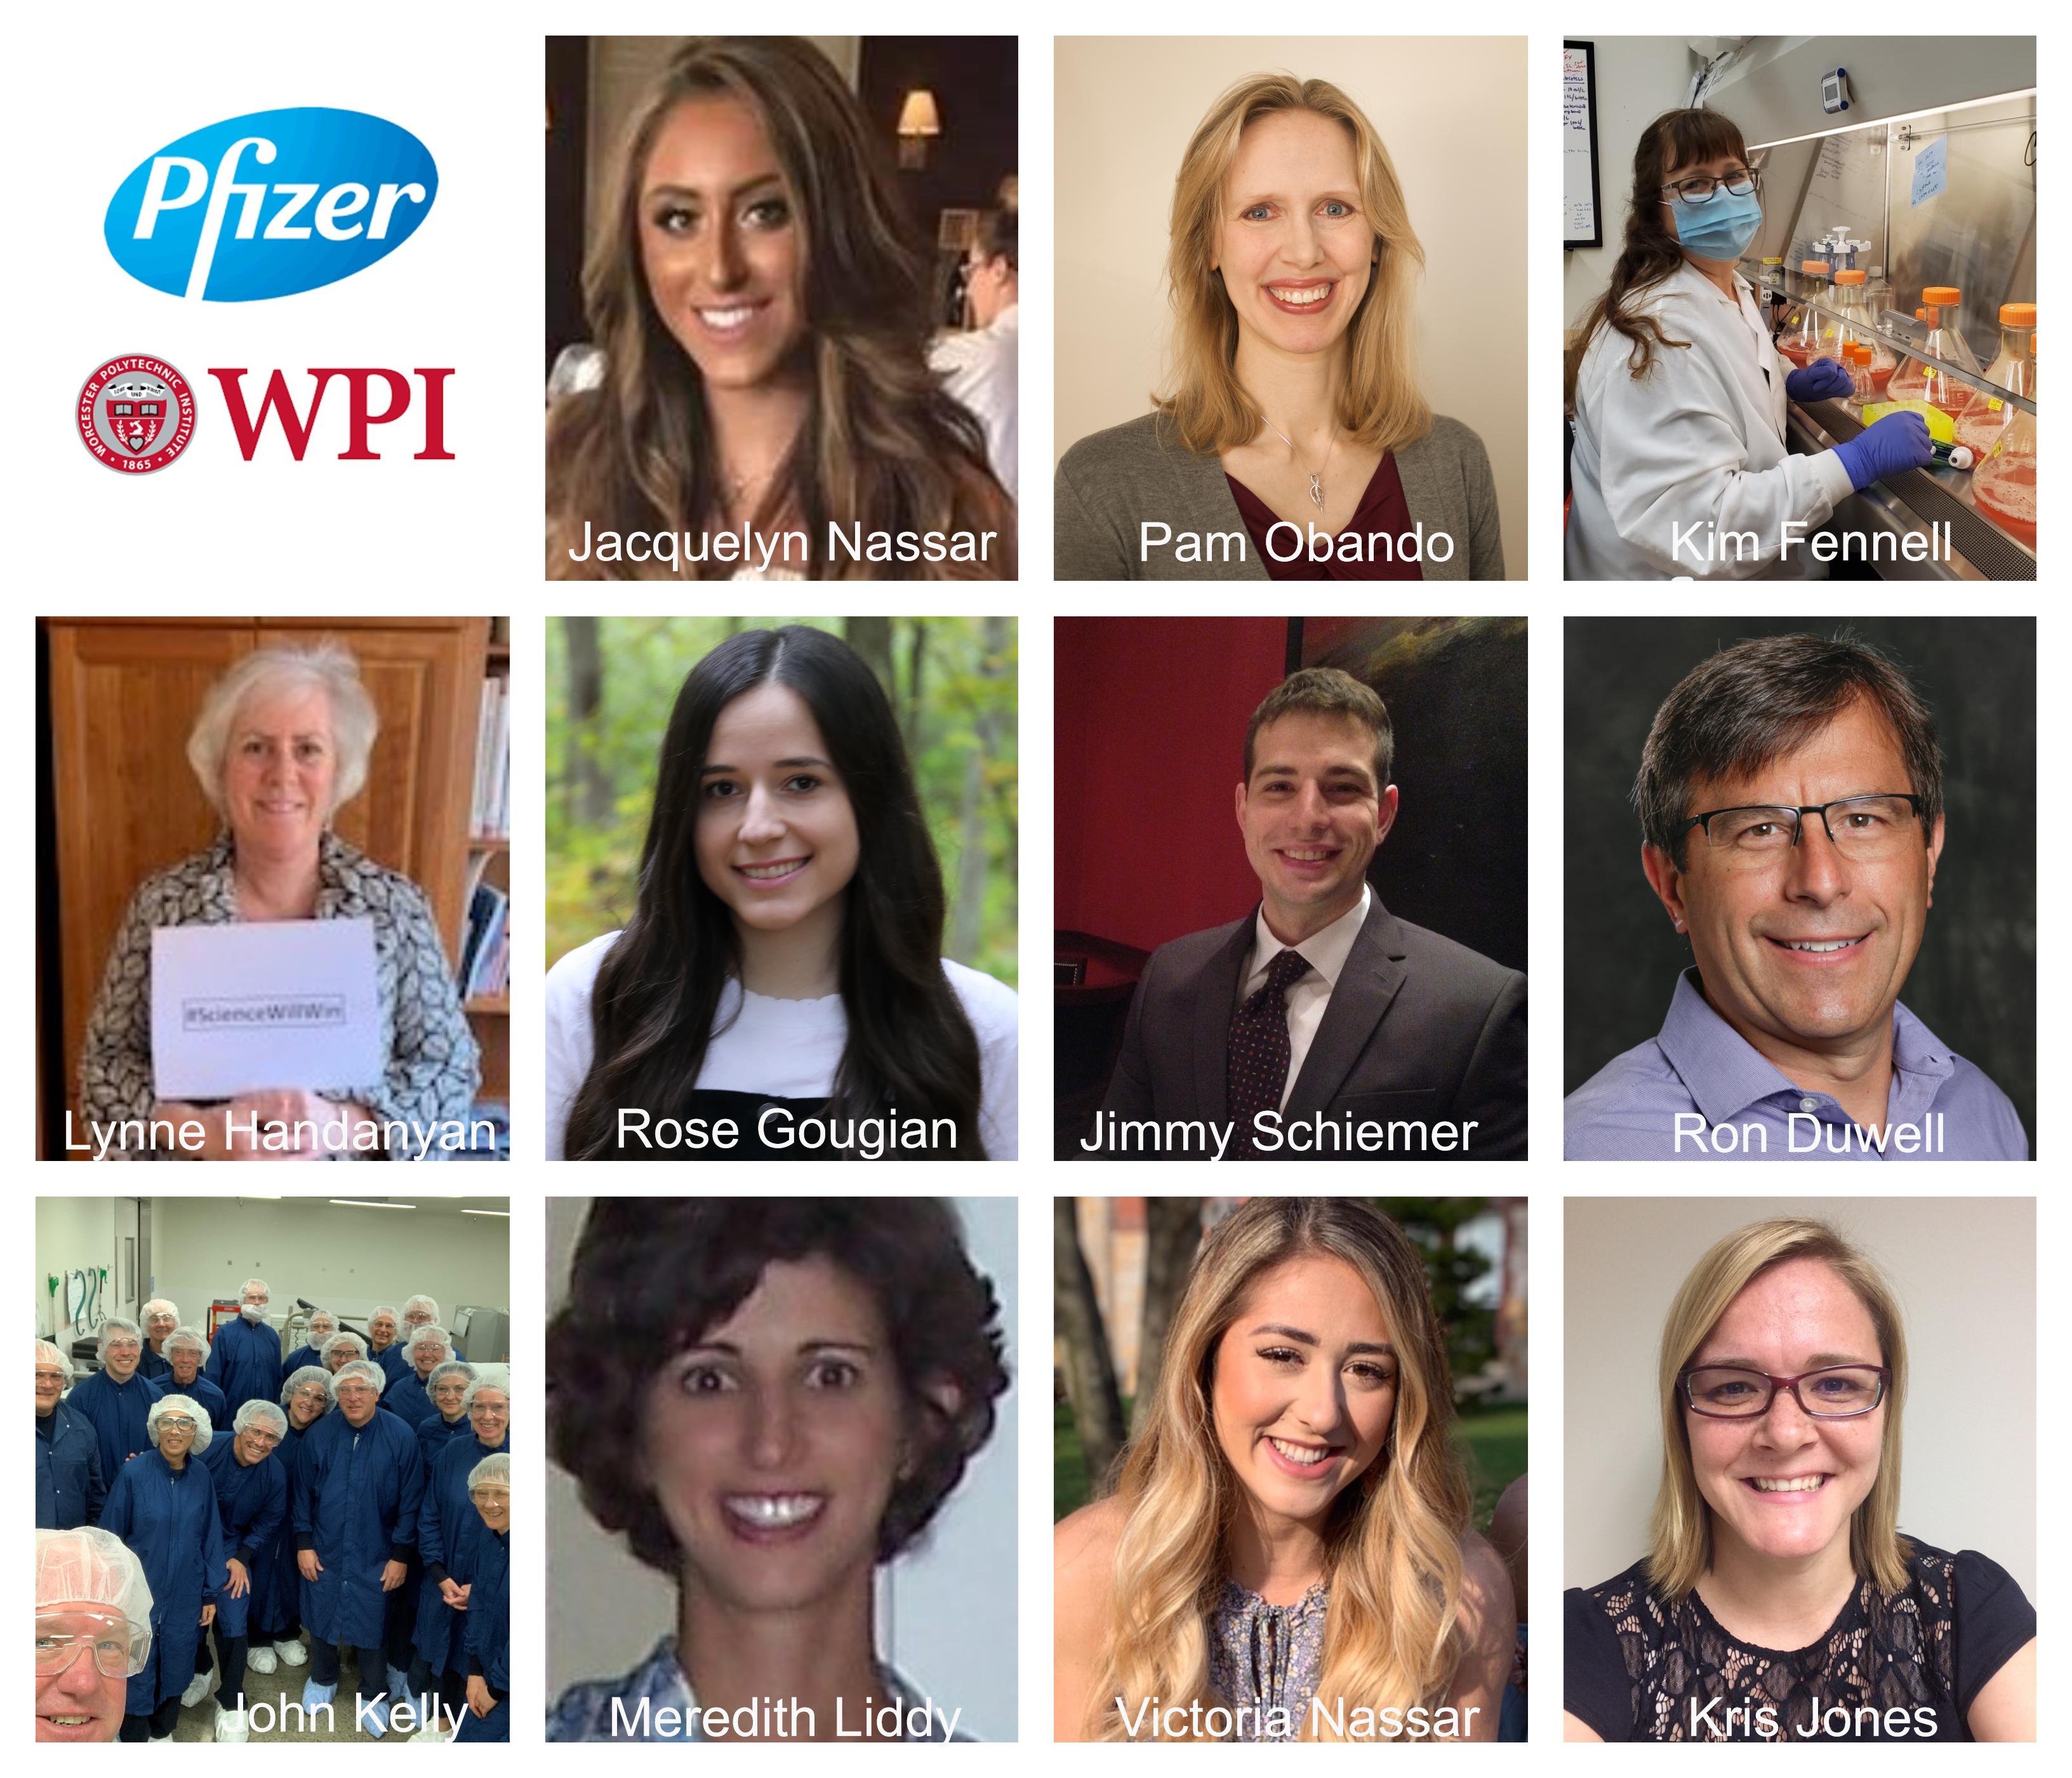 WPI alumni working at Pfizer